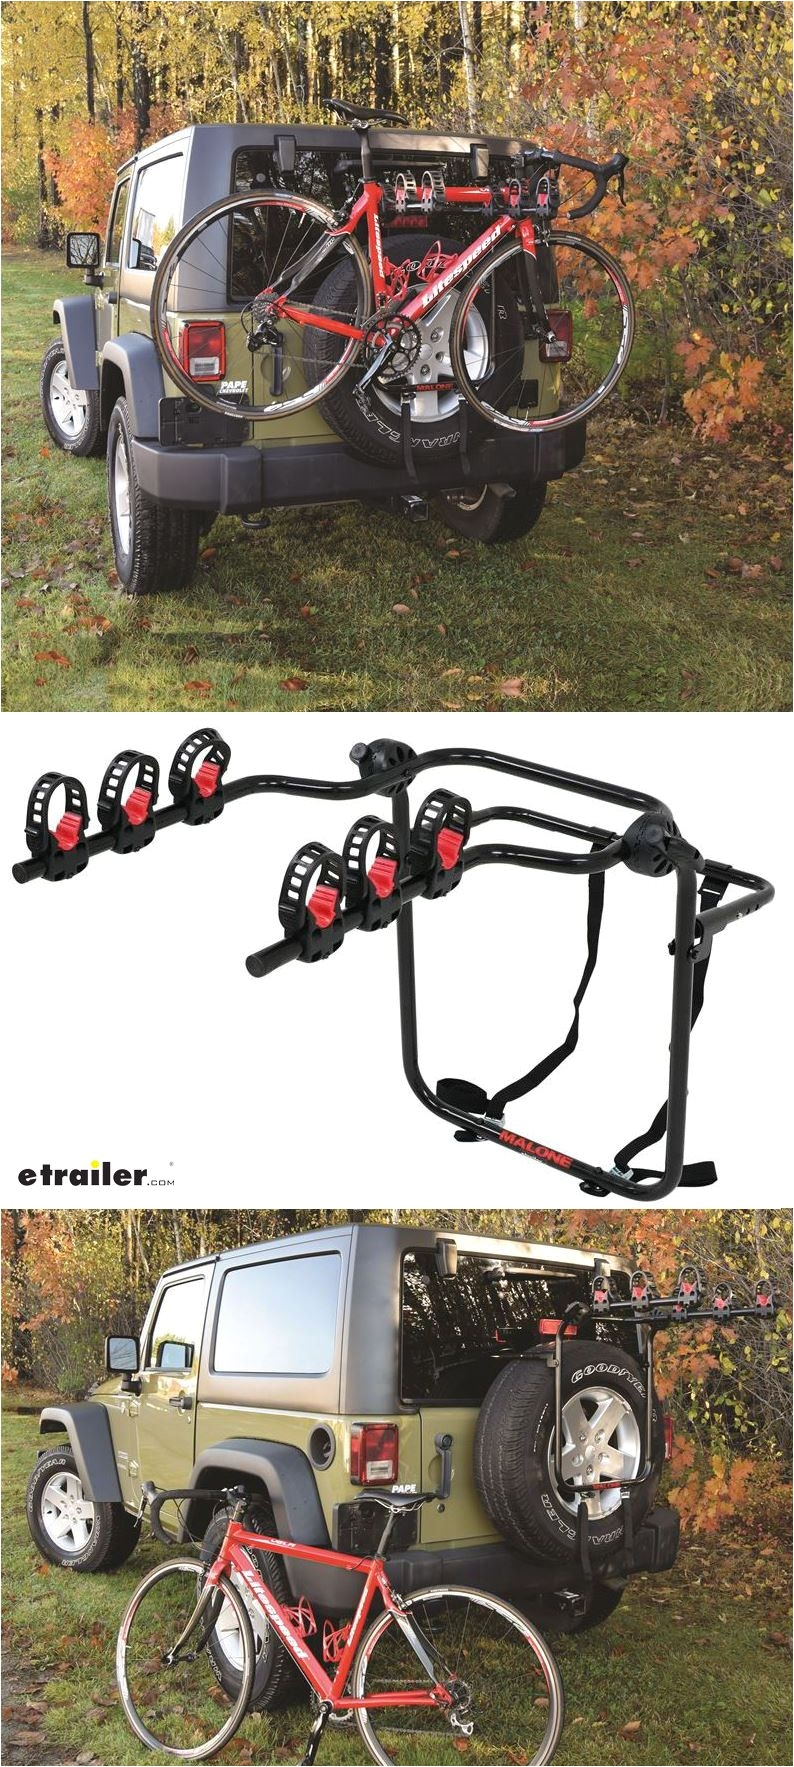 malone runway 3 bike rack spare tire mount folding arms